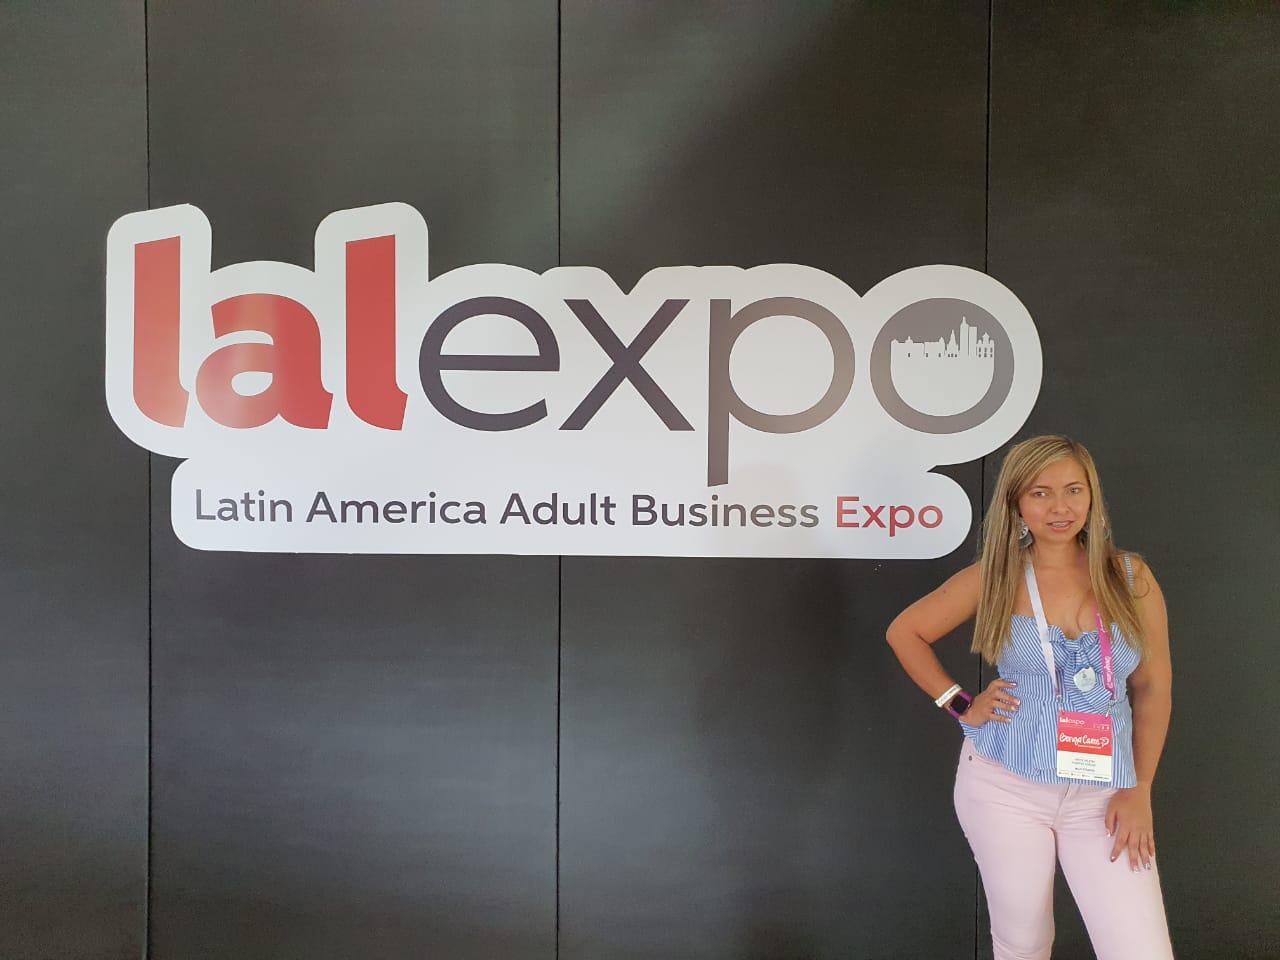 Lalexpo Cali 2020 Maju Studios Presente